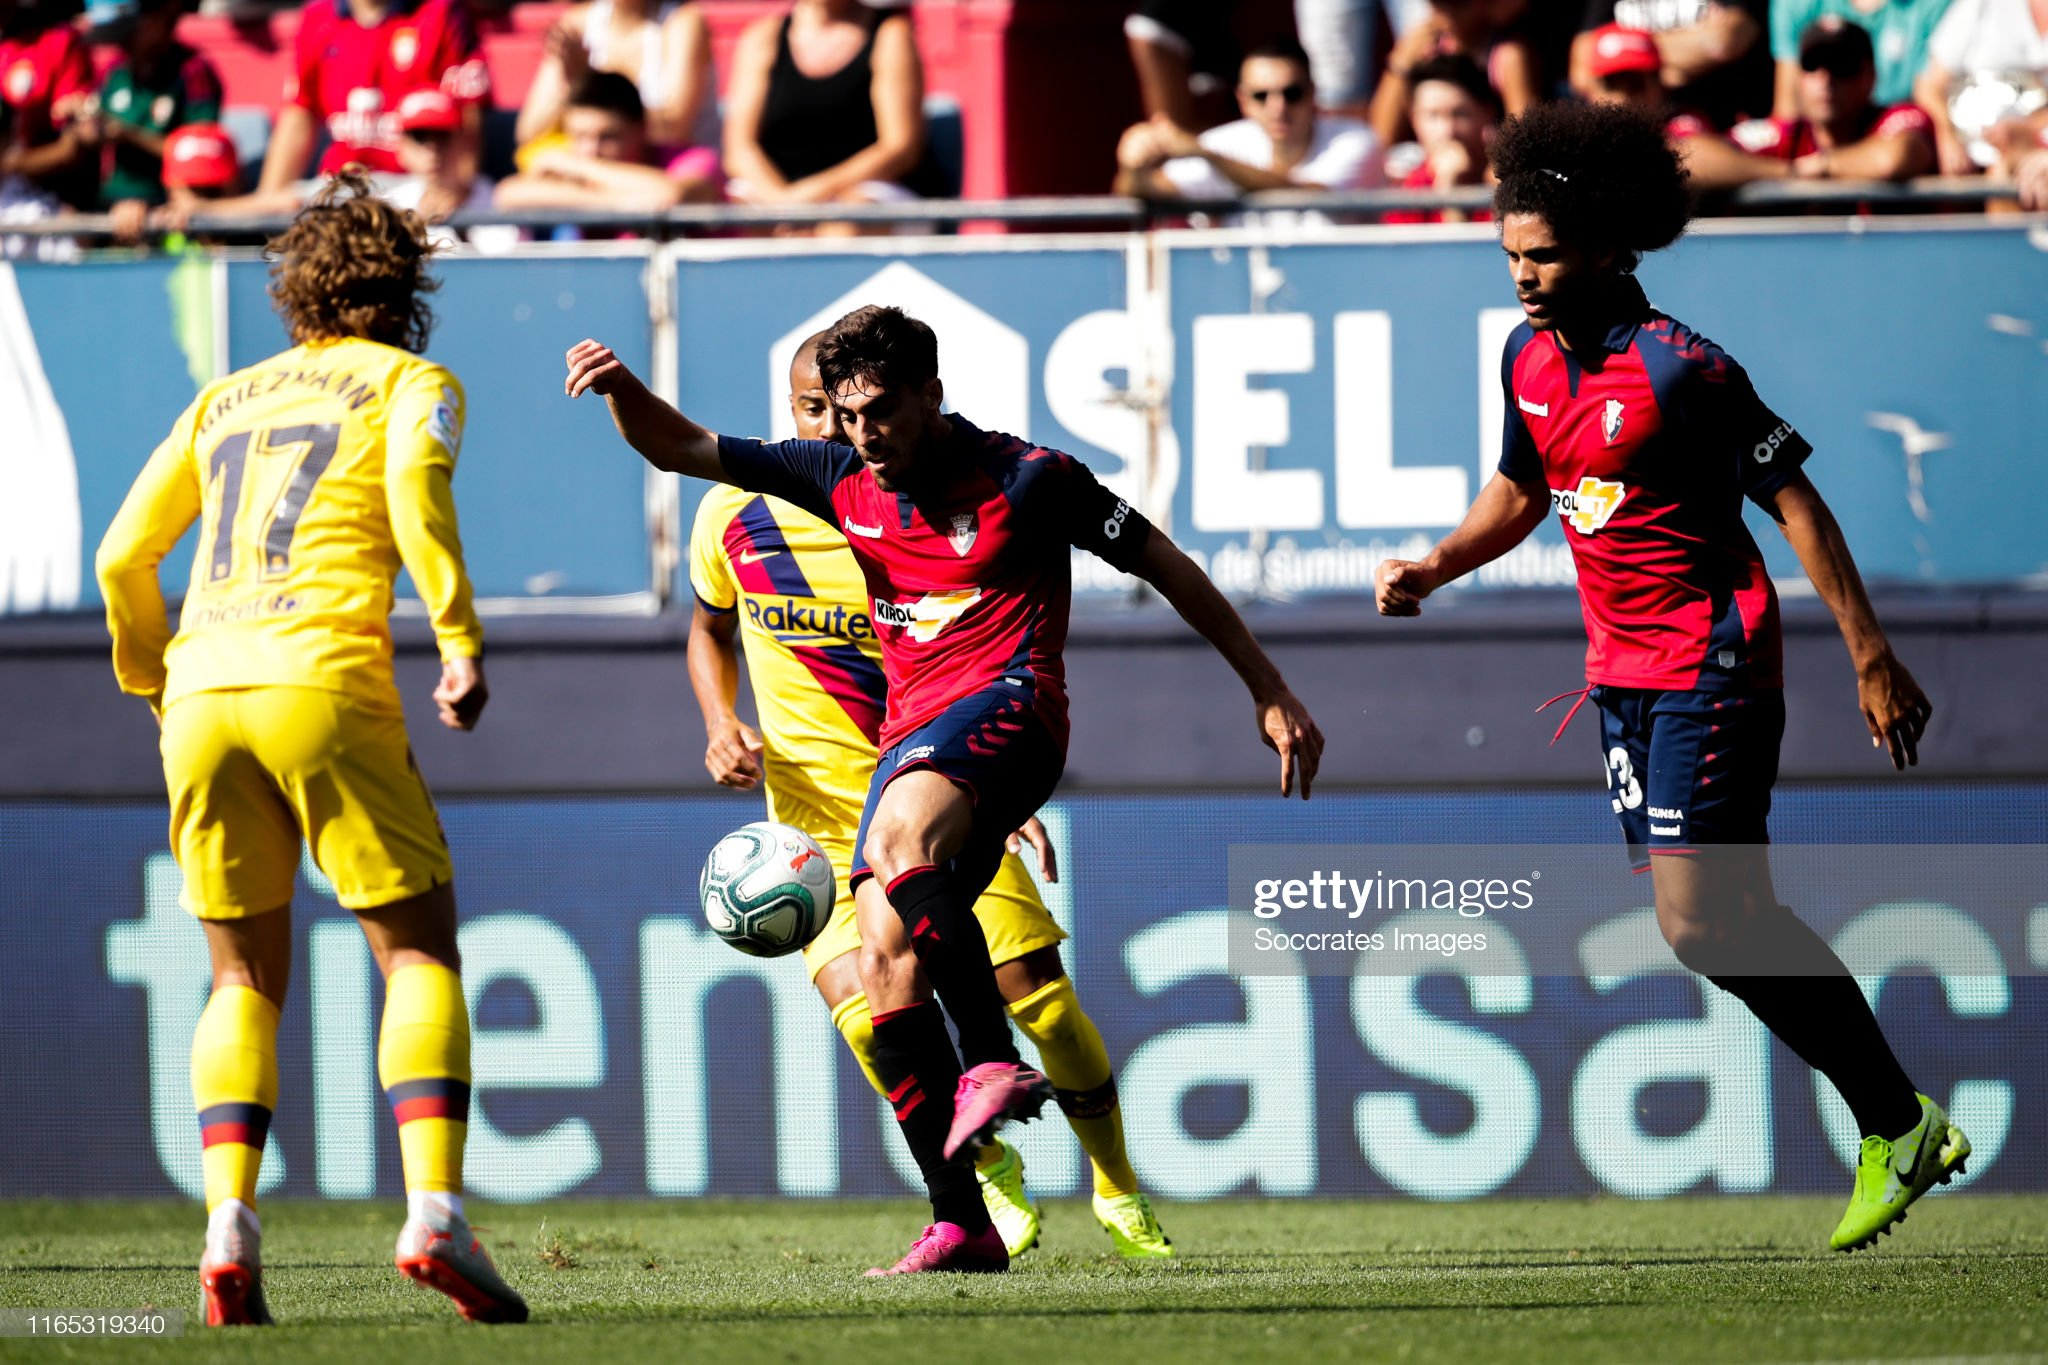 صور مباراة : أوساسونا - برشلونة 2-2 ( 31-08-2019 )  Nacho-vidal-of-ca-osasuna-during-the-la-liga-santander-match-between-picture-id1165319340?s=2048x2048